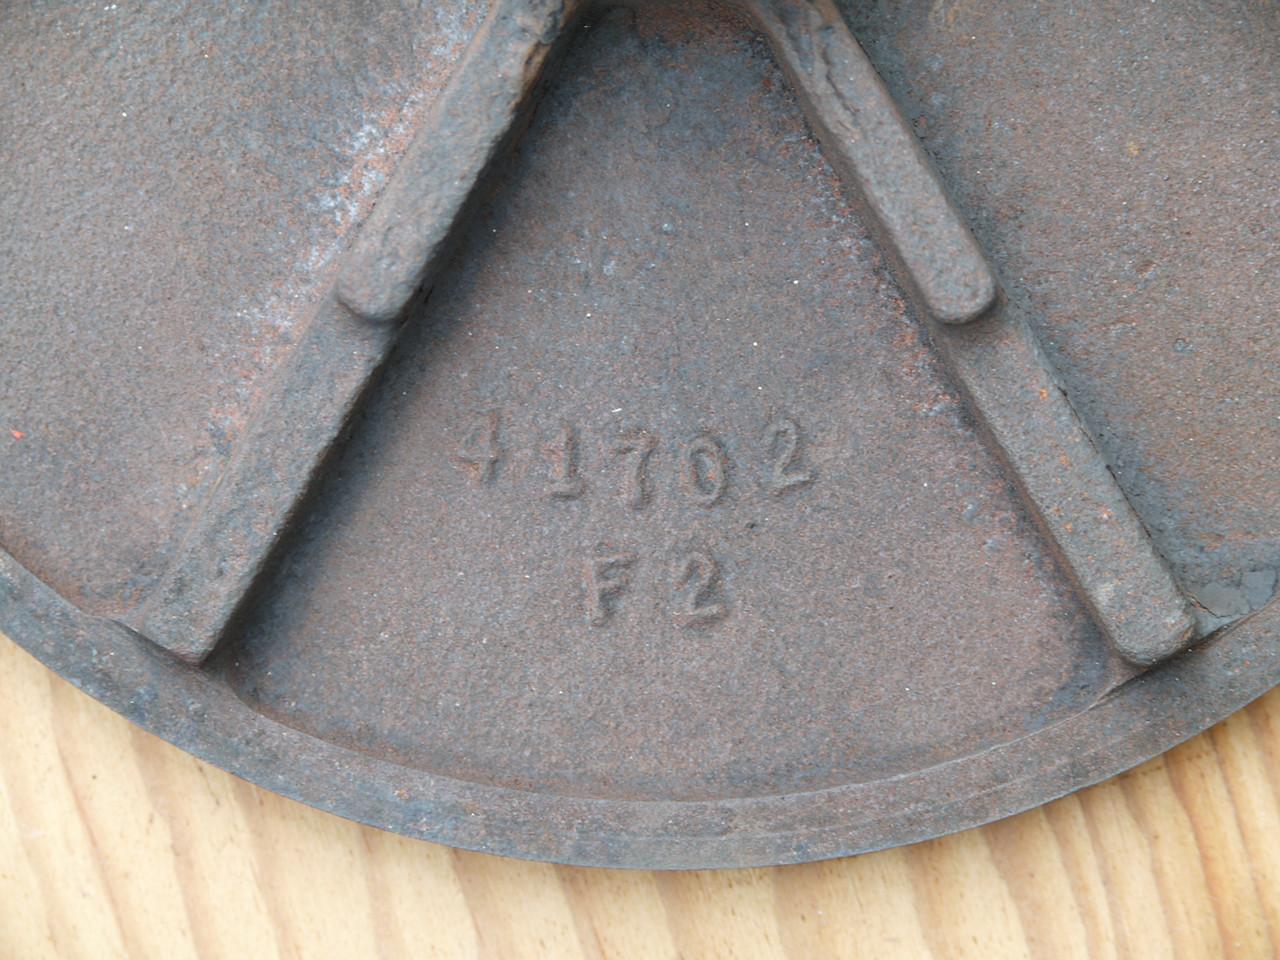 Craftsman 536.906100 'Transitional' Drift Breaker-p1050119.jpg